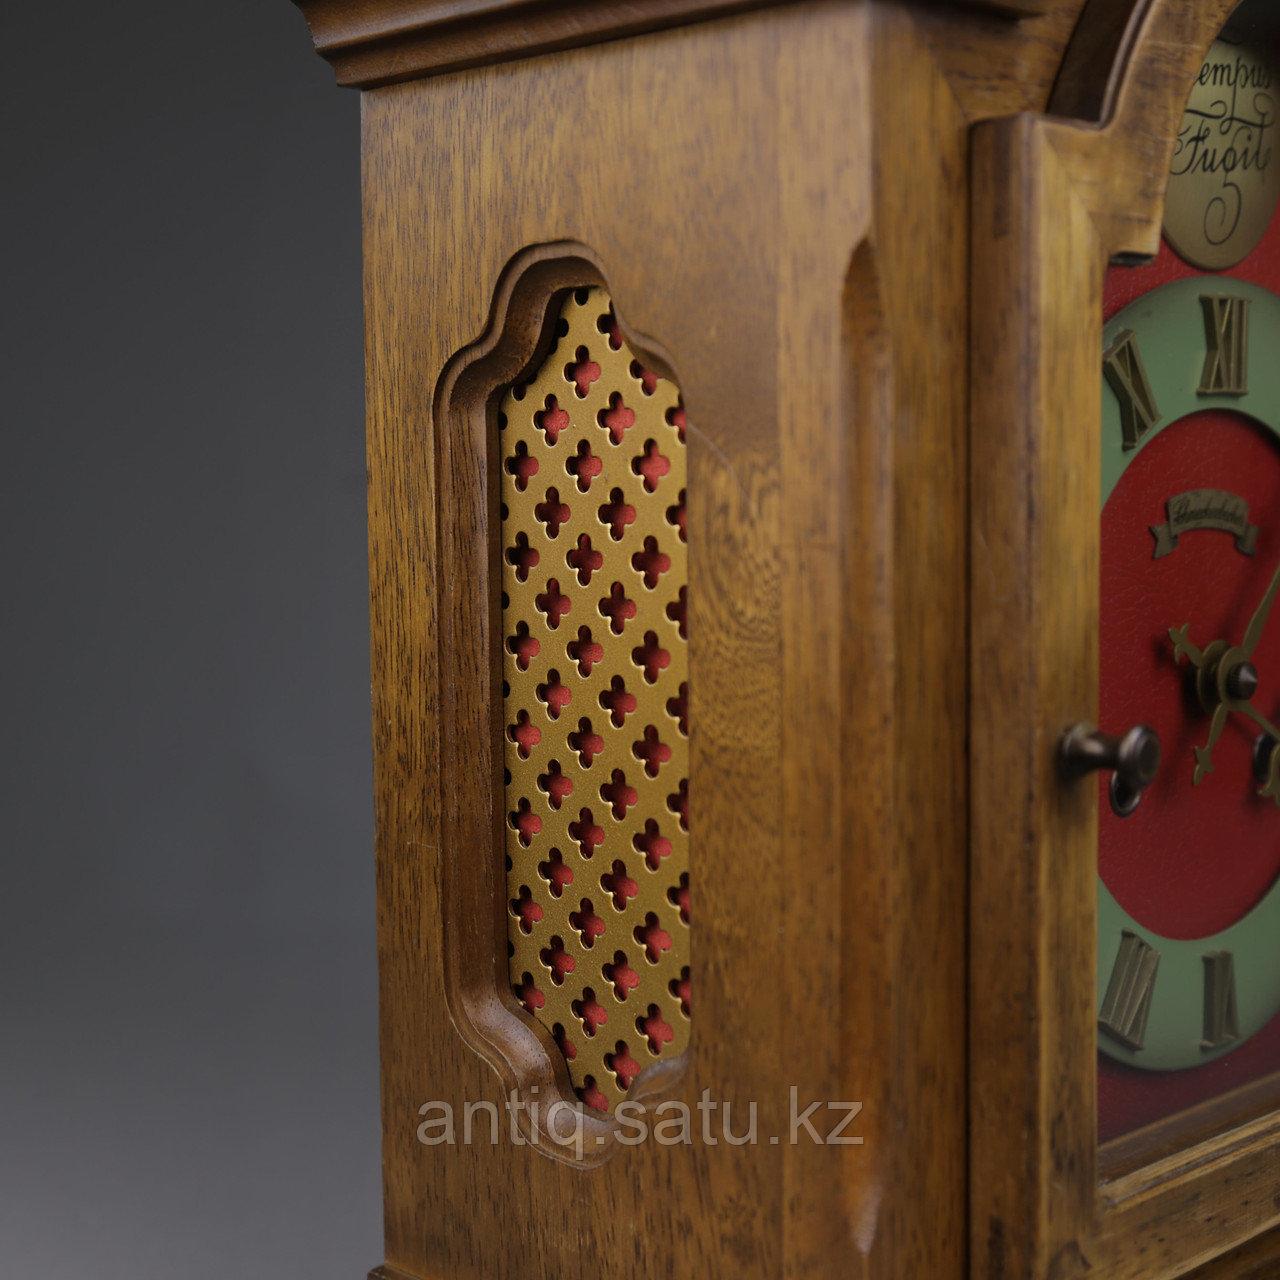 Настольные часы. Часовая мастерская Emil Schmeckenbecher - фото 6